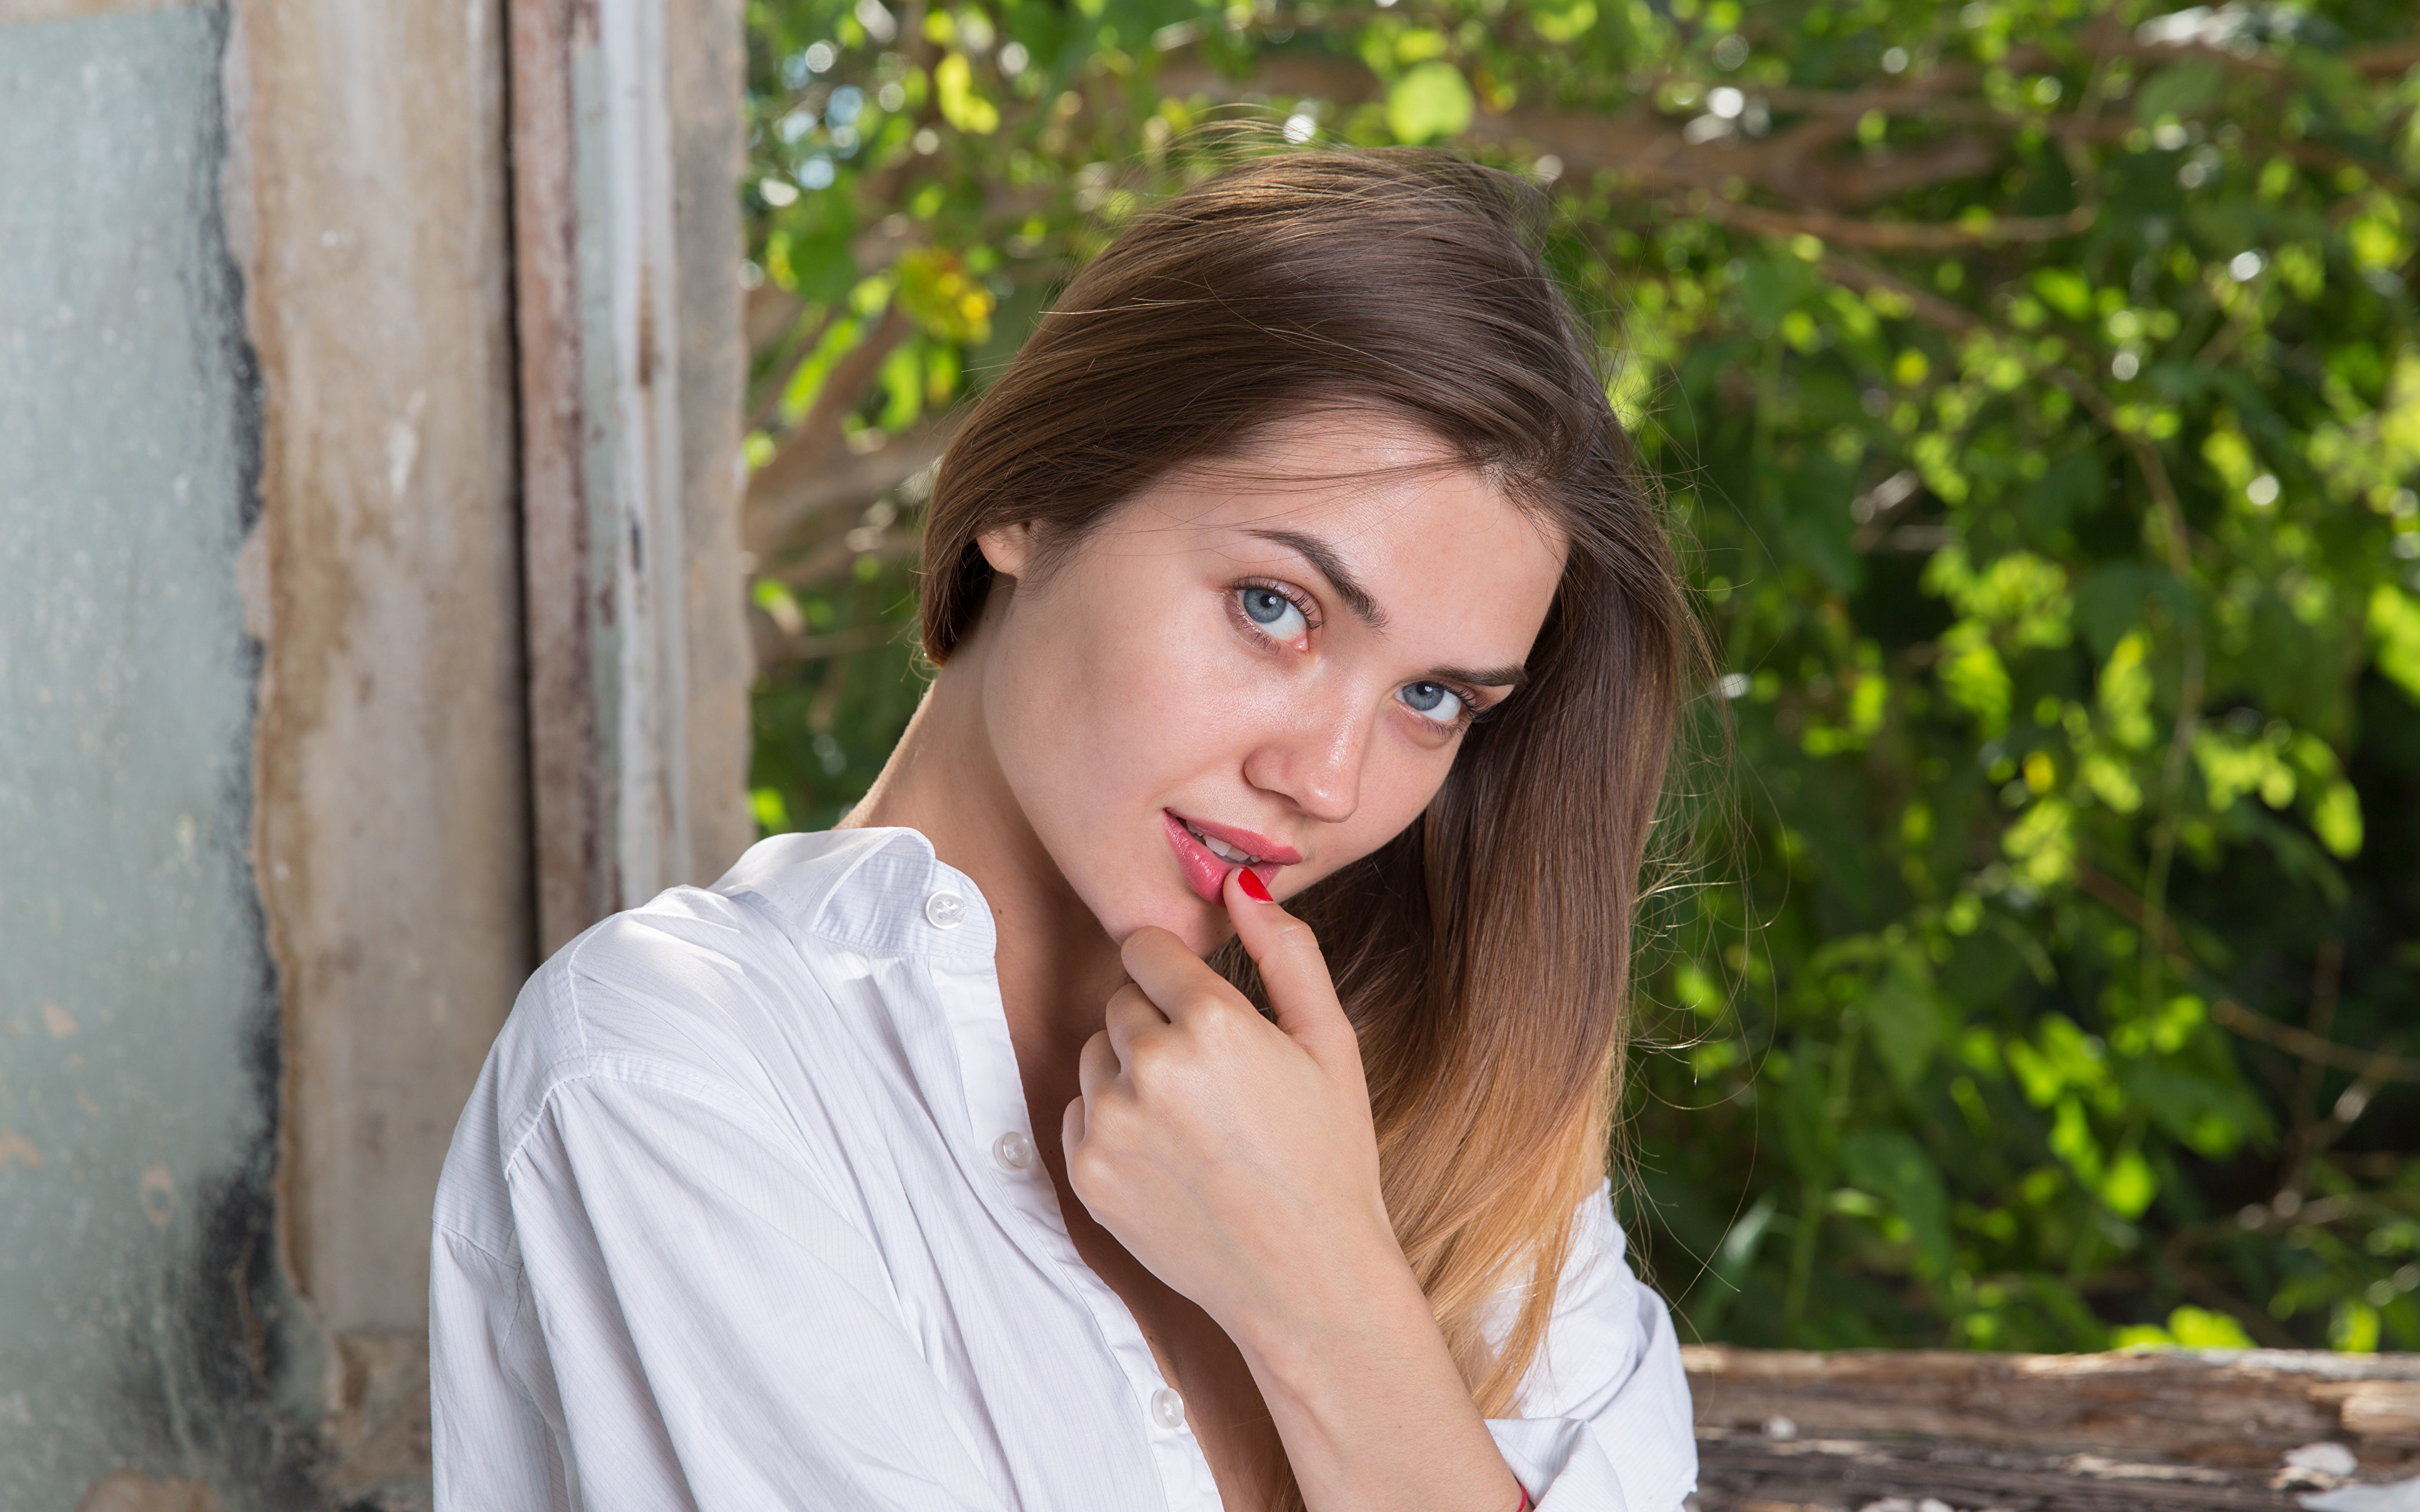 Desktop Wallpapers Polina Kadynskaya, Georgia Brown haired female Hands Staring 3840x2400 Girls young woman Glance